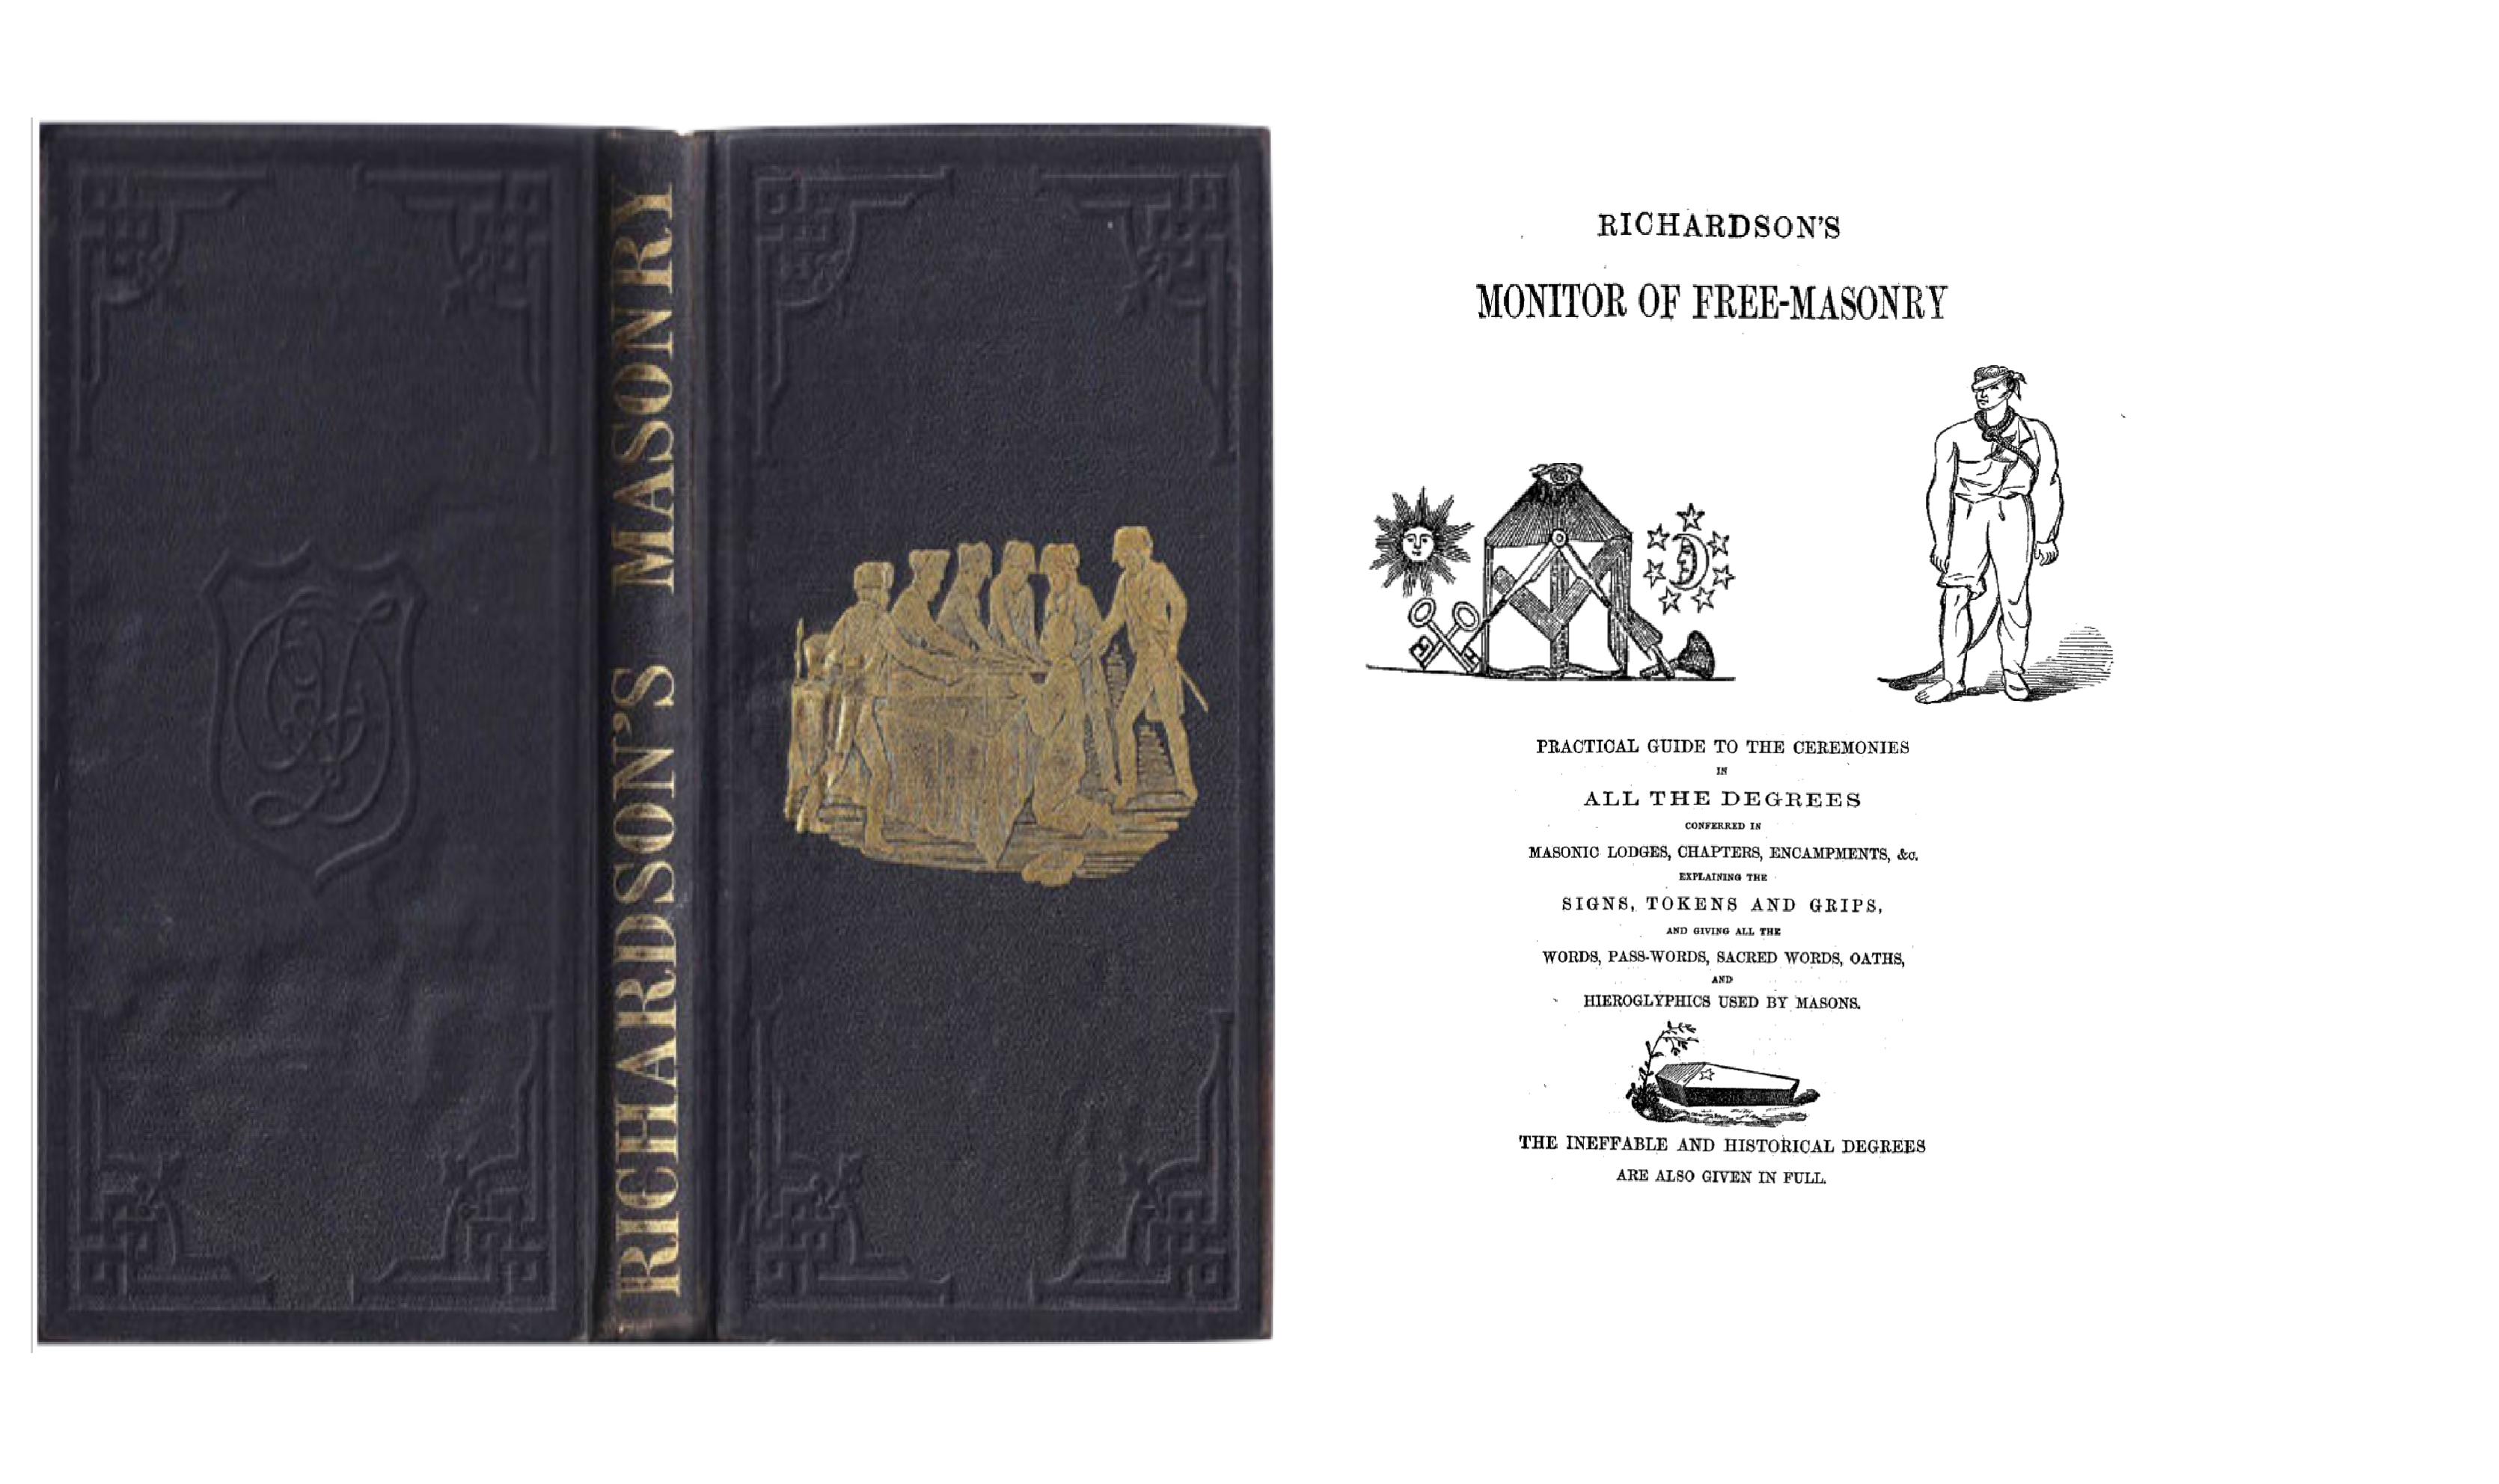 Richardson's Monitor of Freemasonry MASONIC BOOK Freemasonry